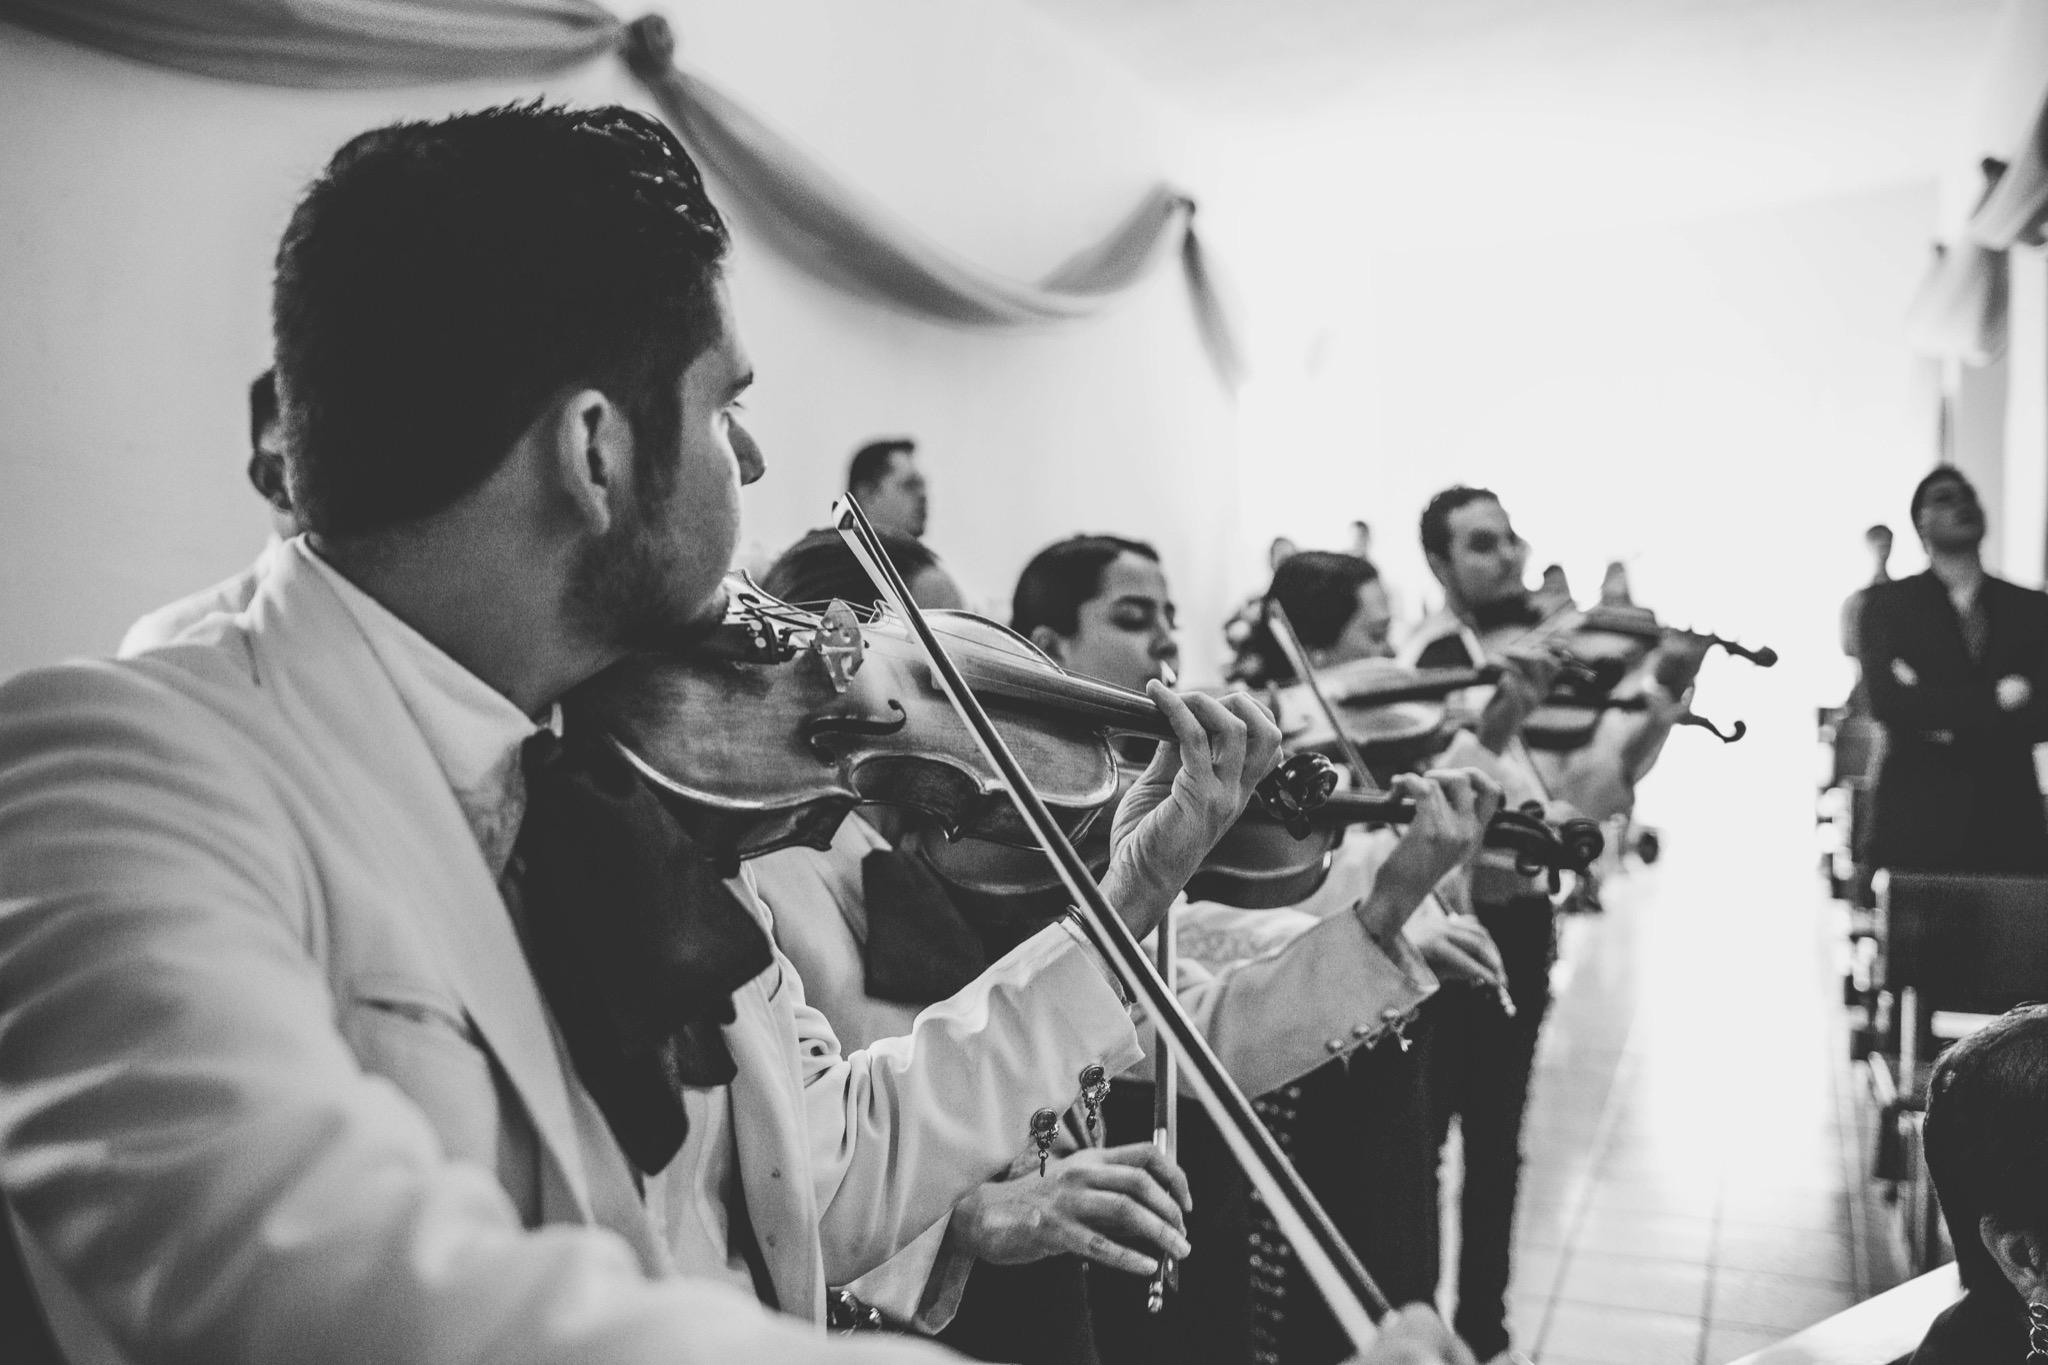 javier_noriega_fotografo_profesional_bodas_zacatecas_mexico_chihuahua_photographer_13